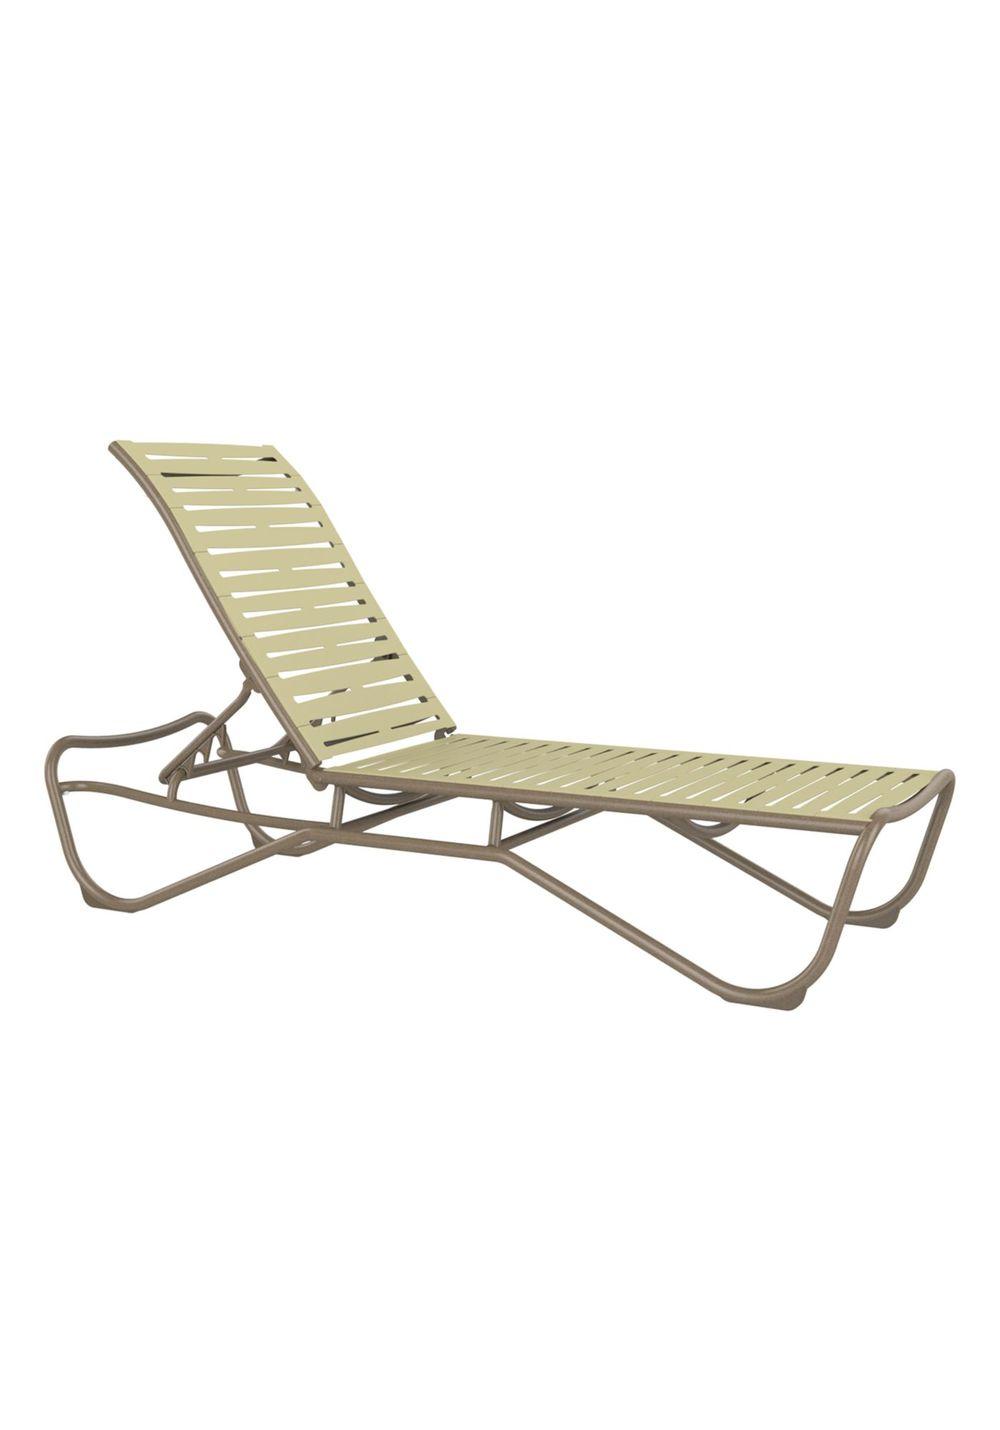 Tropitone Furniture - Chaise Lounge, Armless